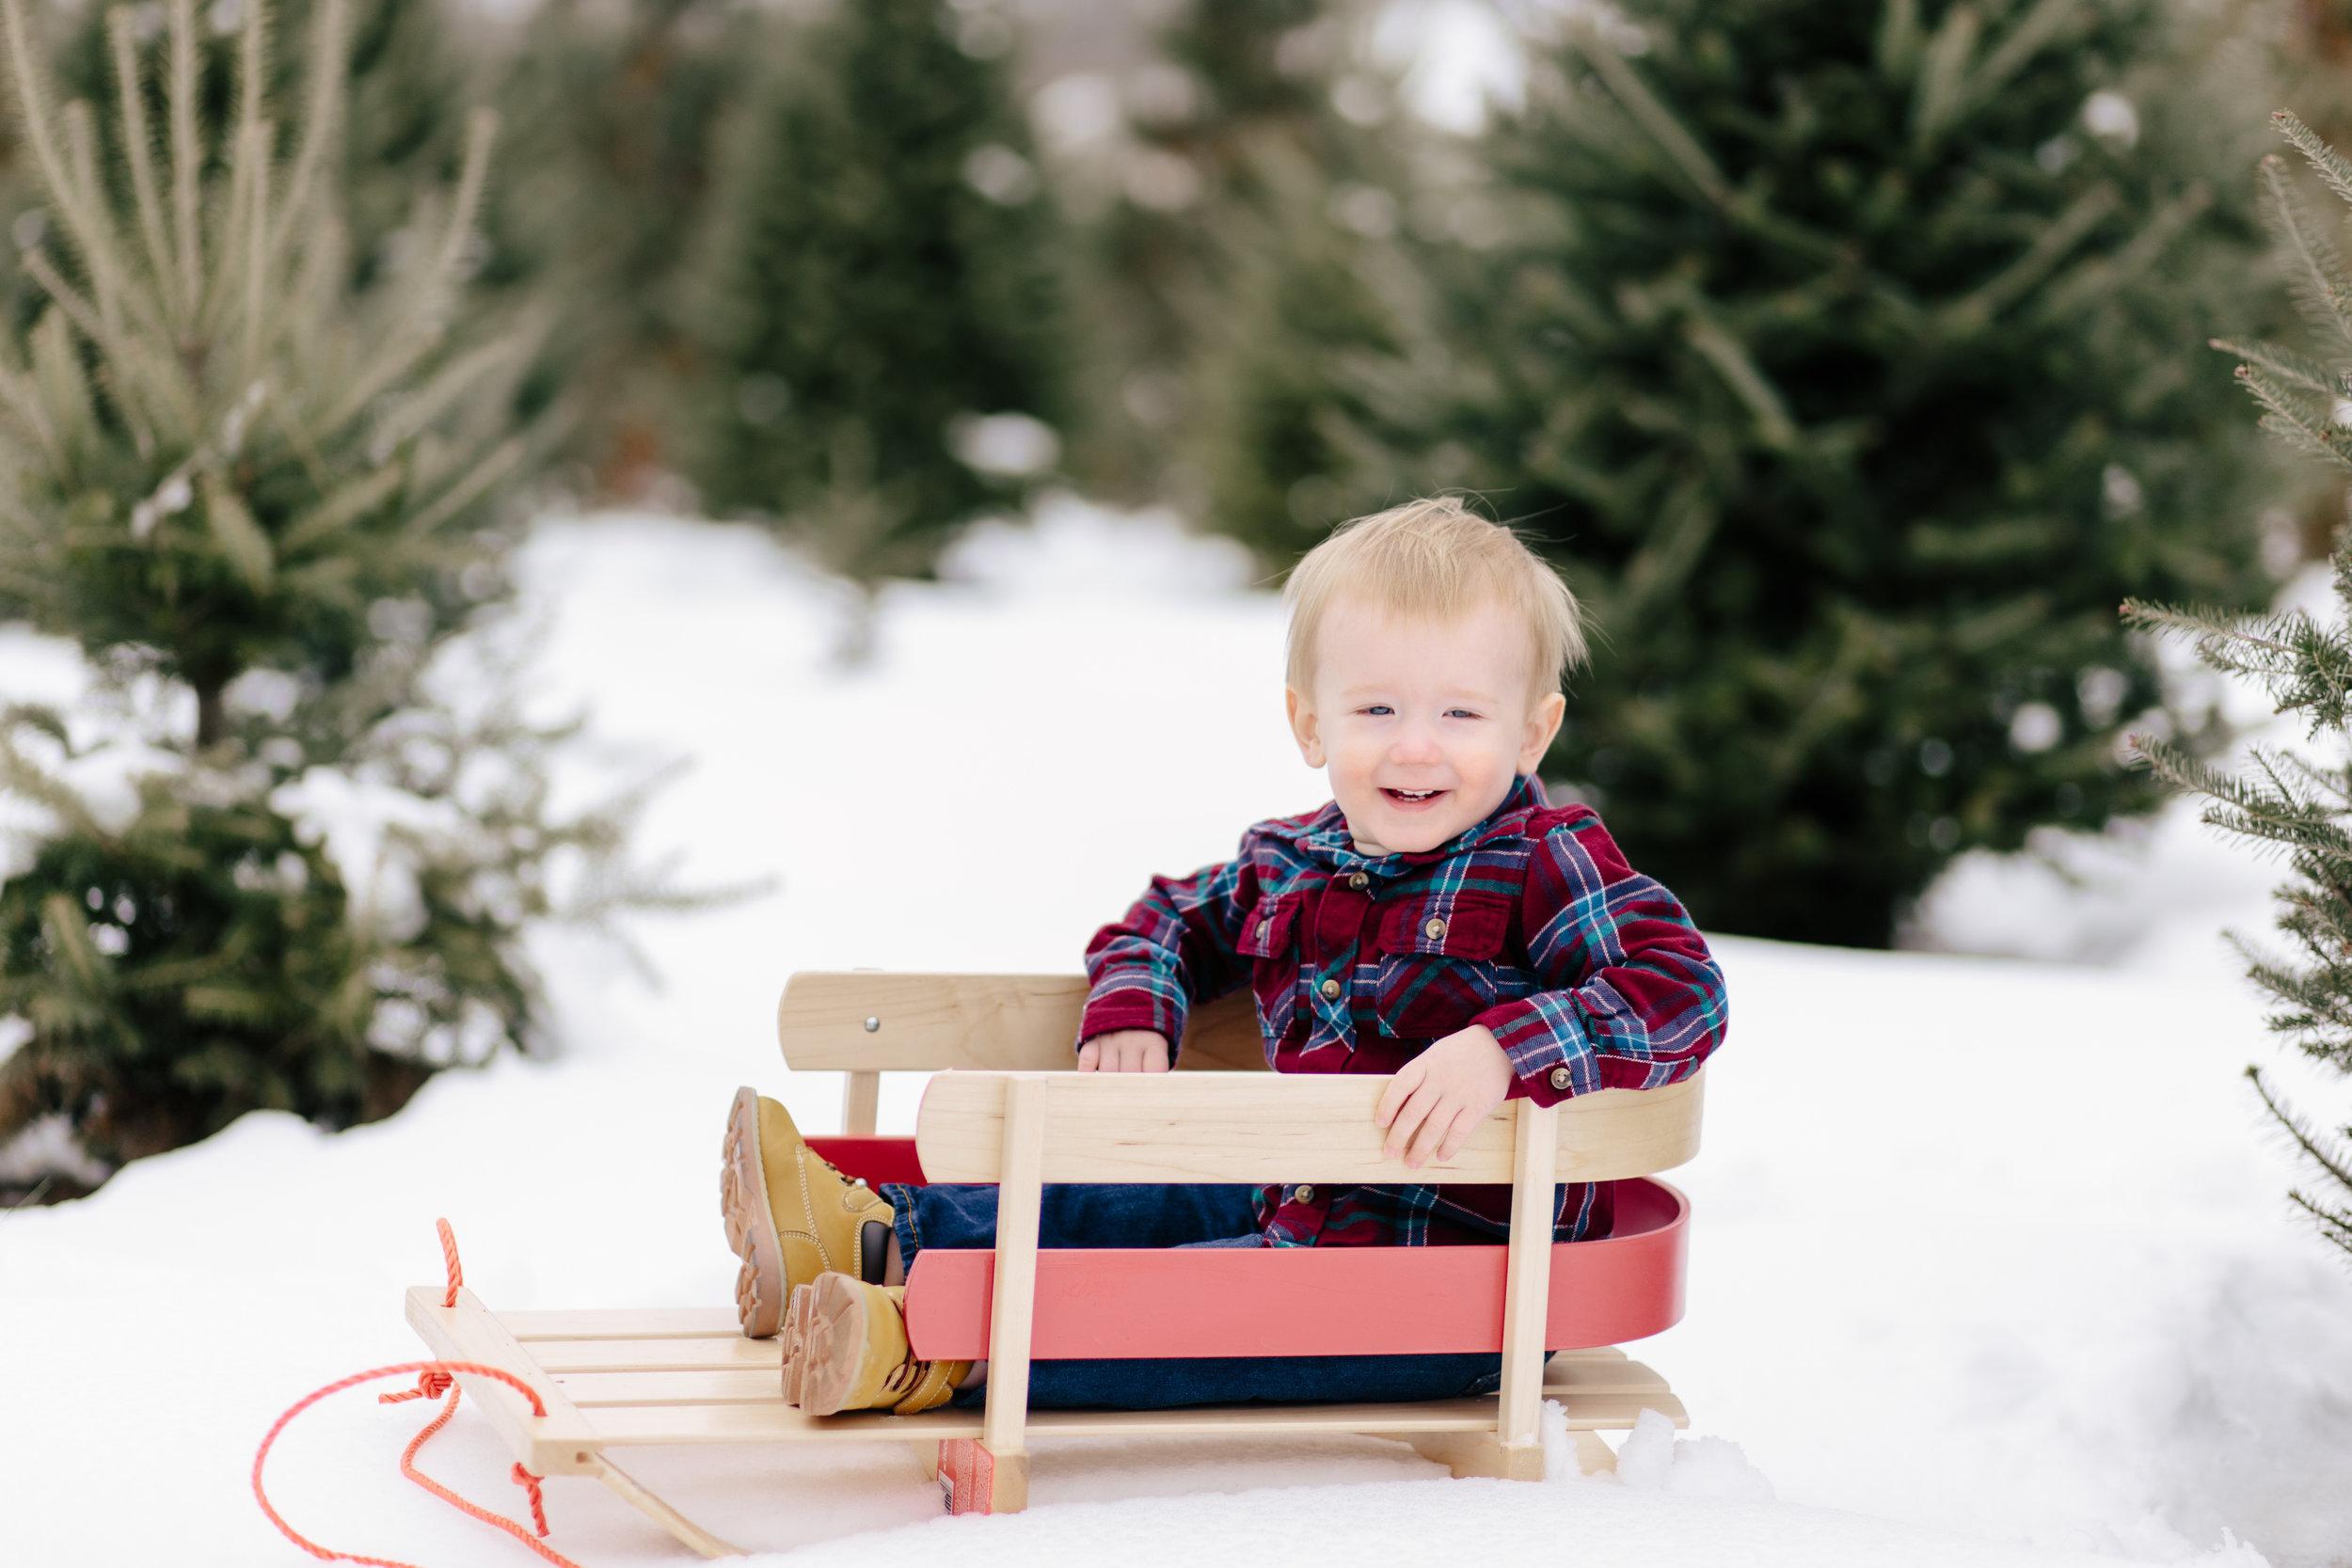 saundra_megan_photography_stout_family_christmas-3.jpg